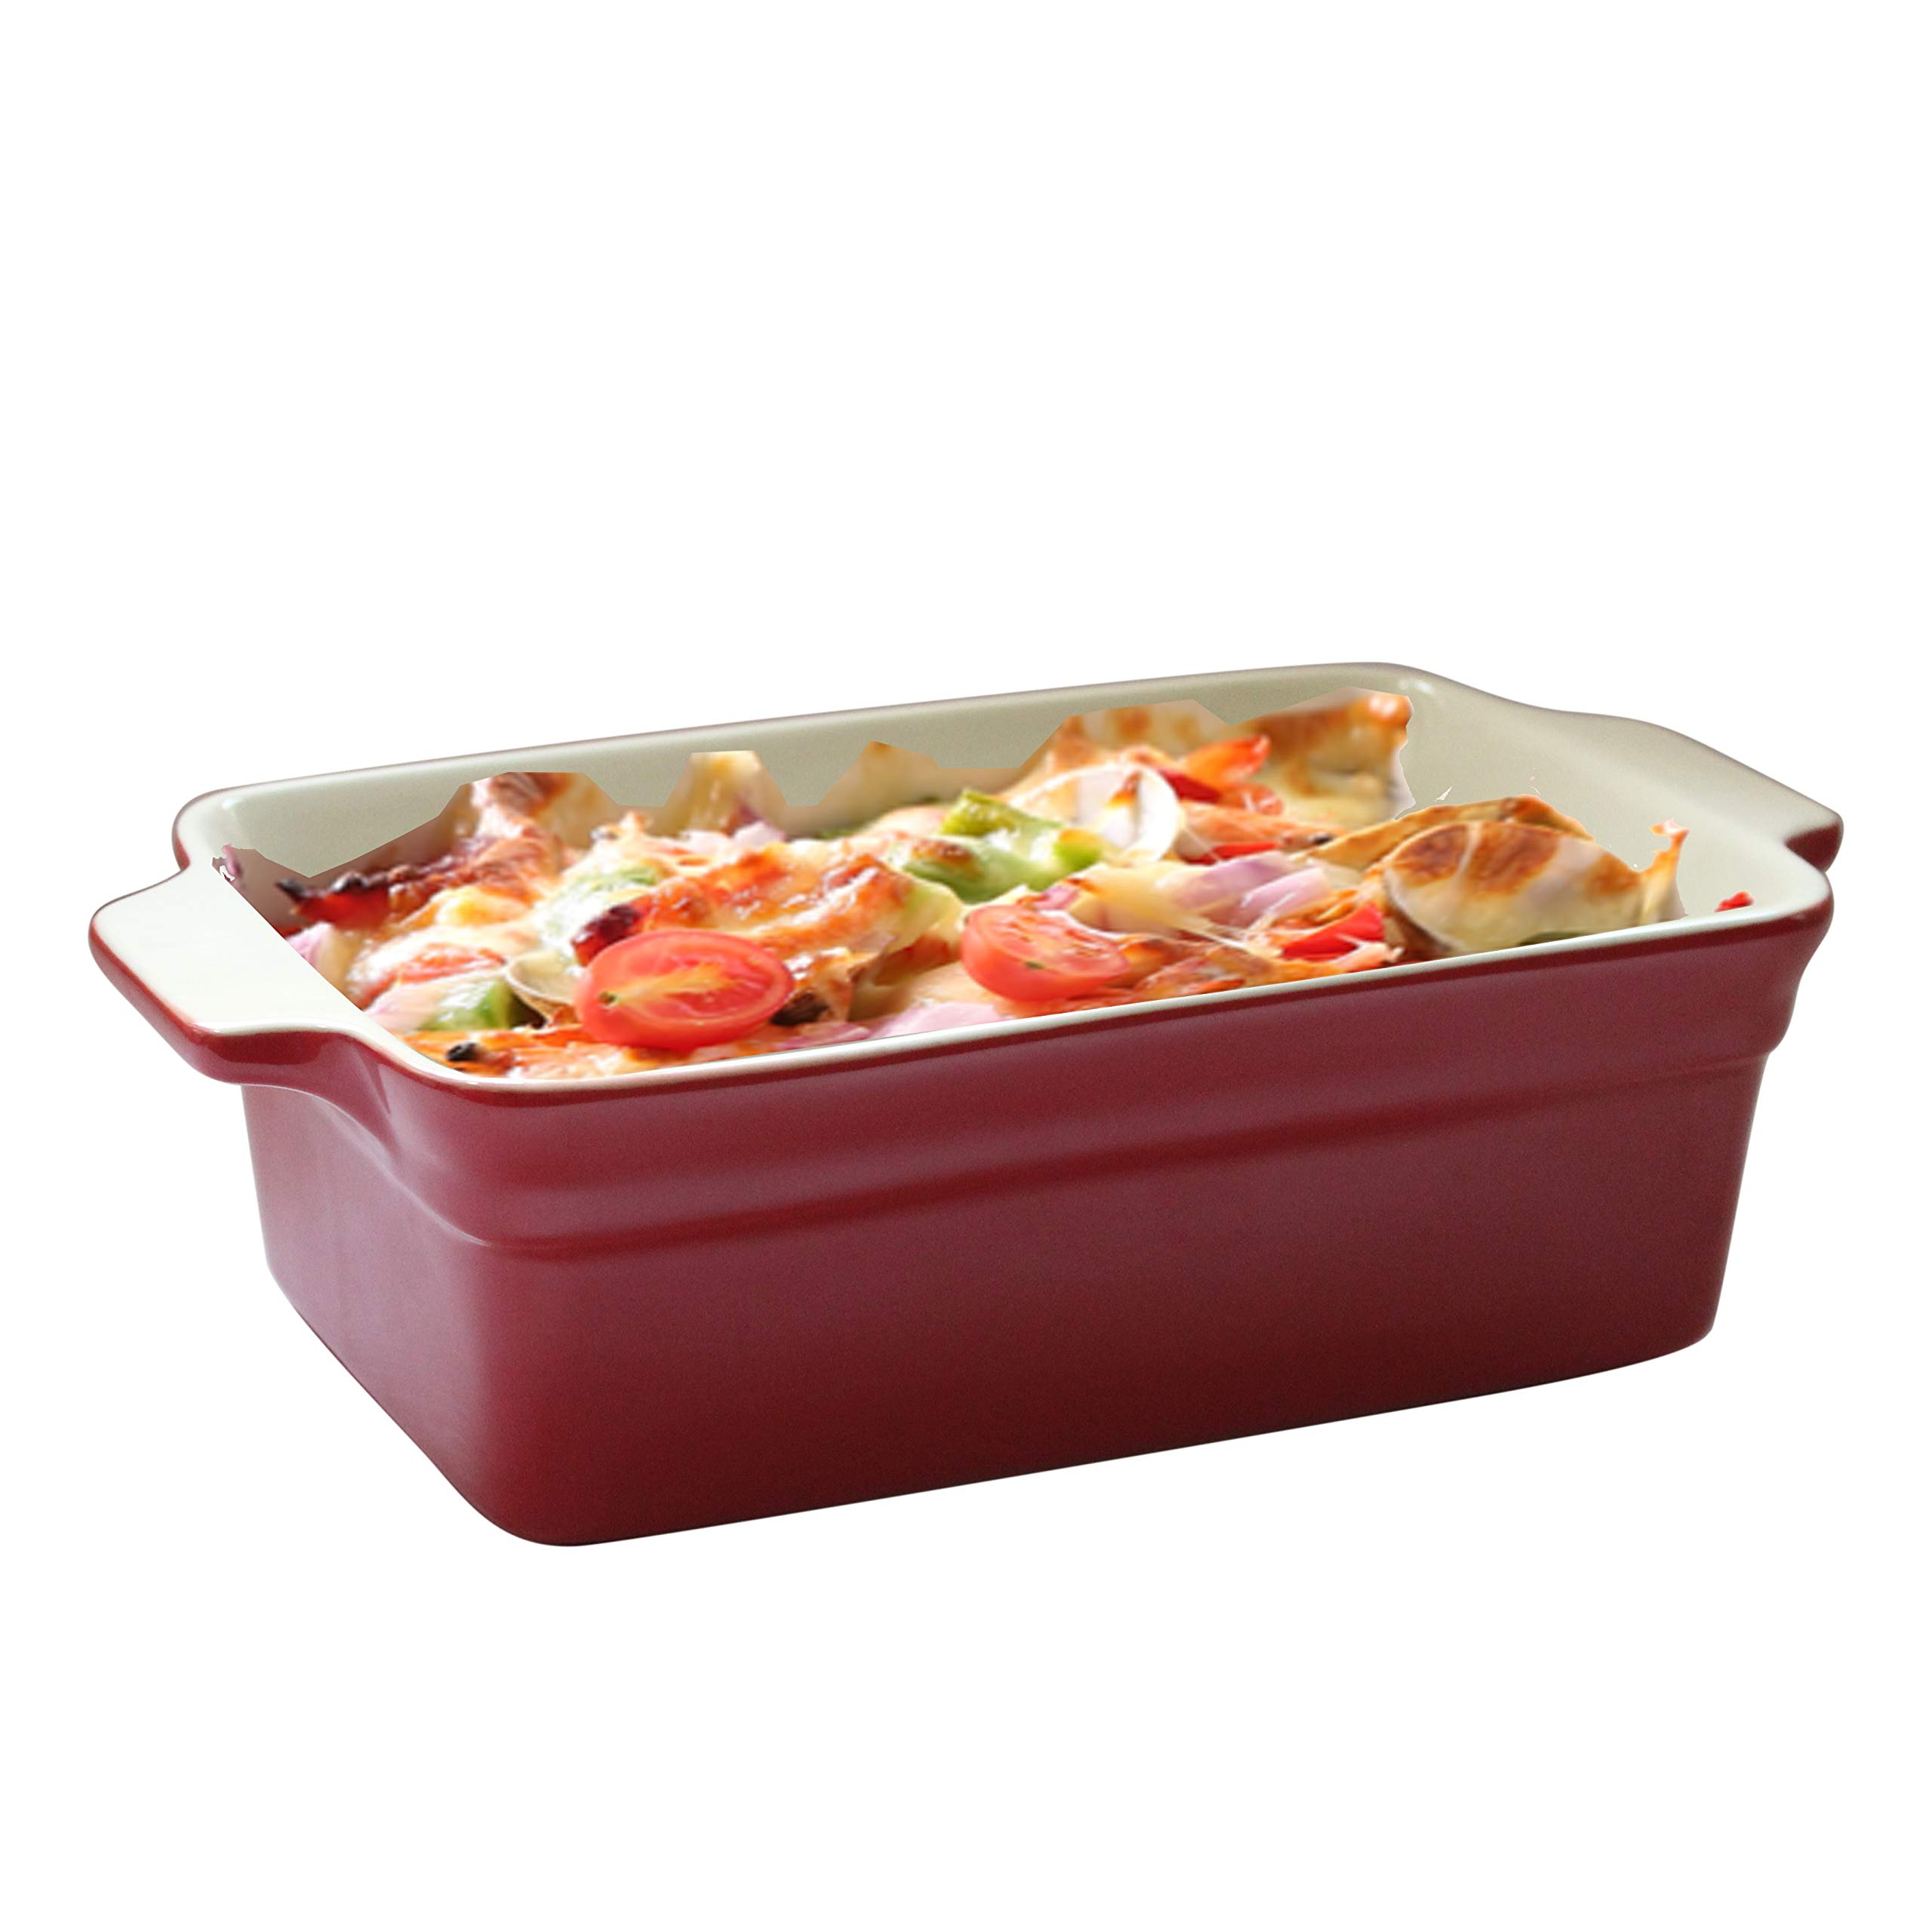 Lonovel Rectangular Baking Dish Roasting Lasagna Pan,11.5-Inch Classic Stoneware Ceramic Large Rectangular Bakers,Red by Lonovel (Image #2)